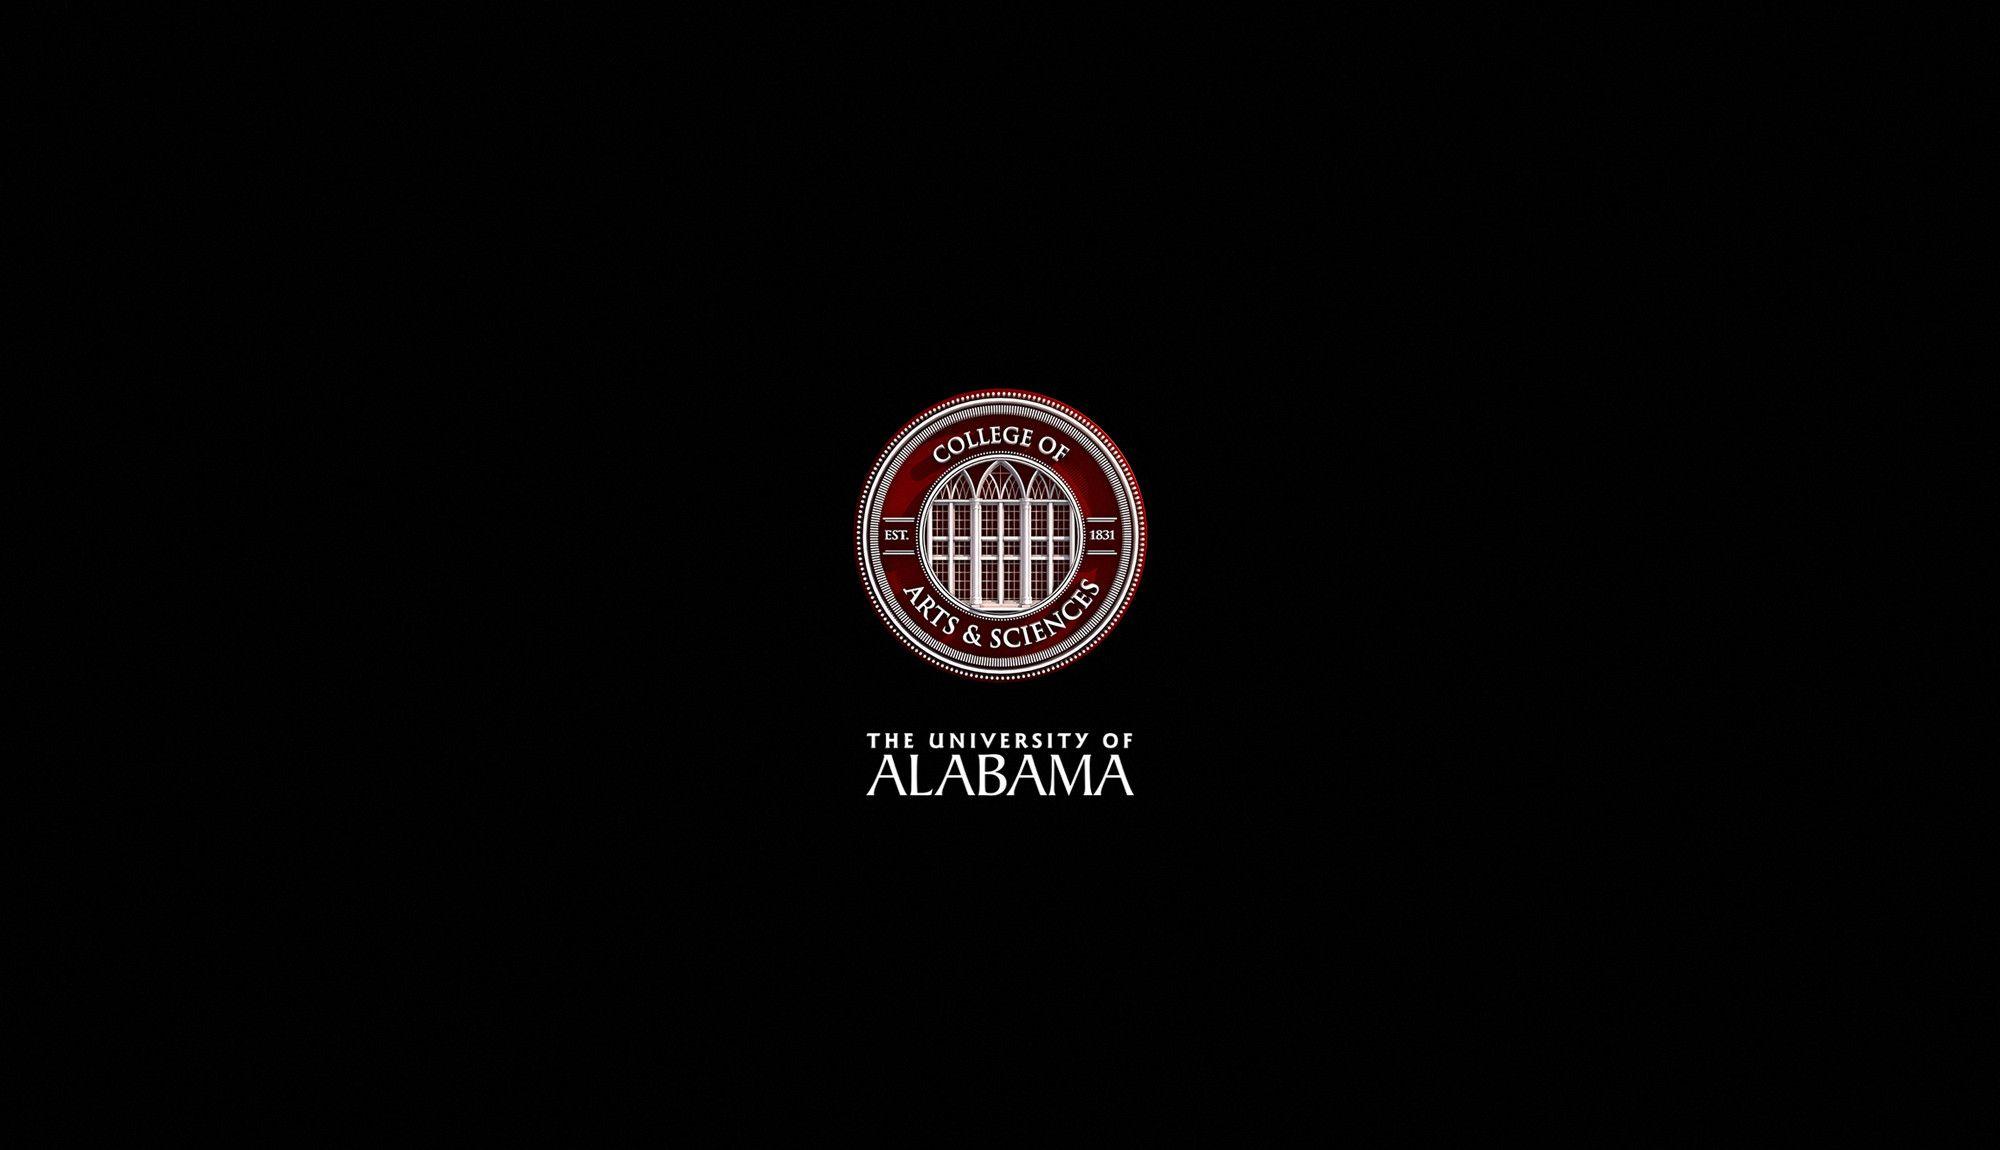 Alabama Crimson Tide Wallpapers 2000x1150